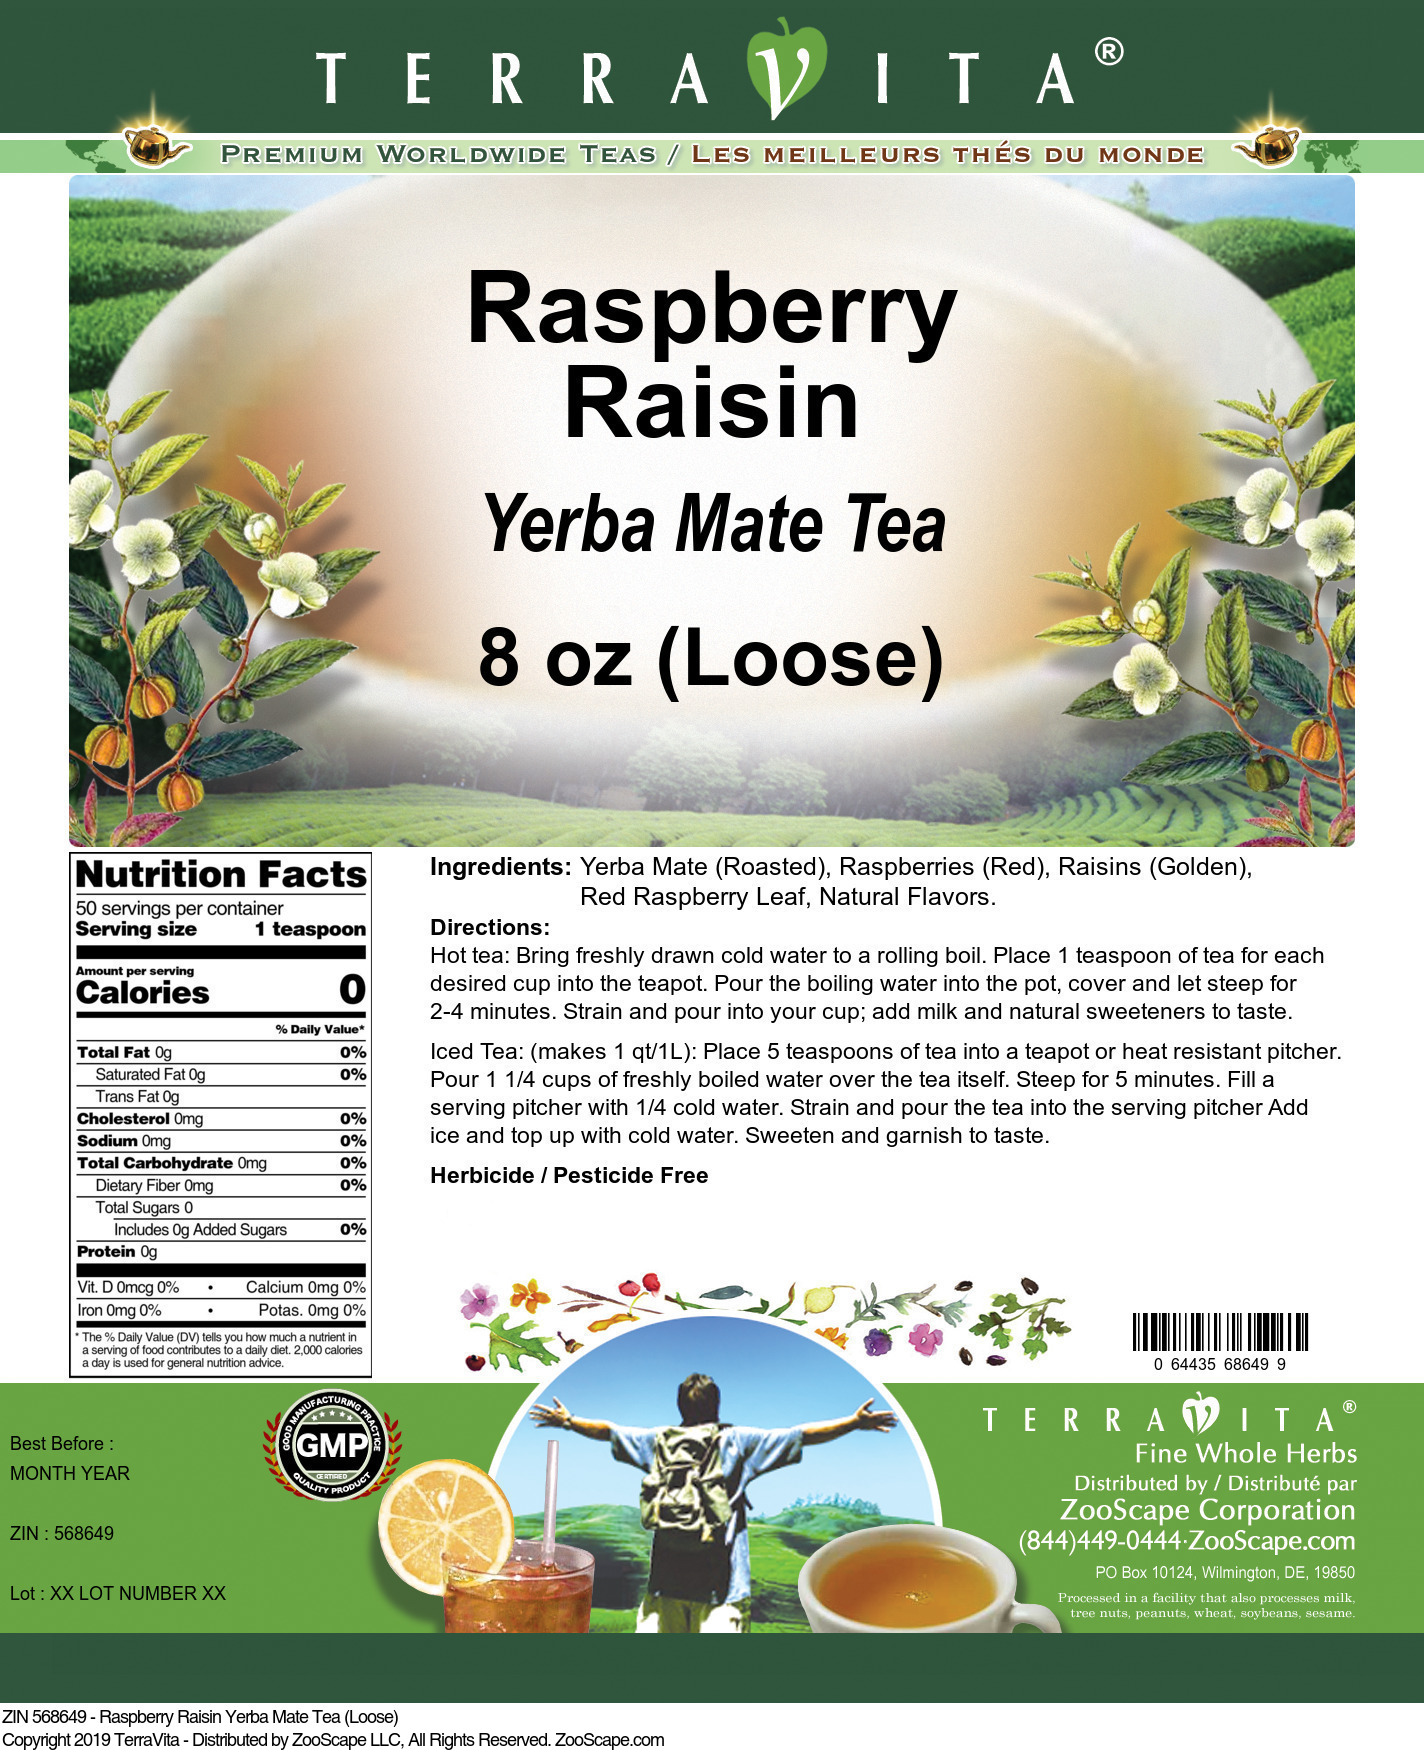 Raspberry Raisin Yerba Mate Tea (Loose)